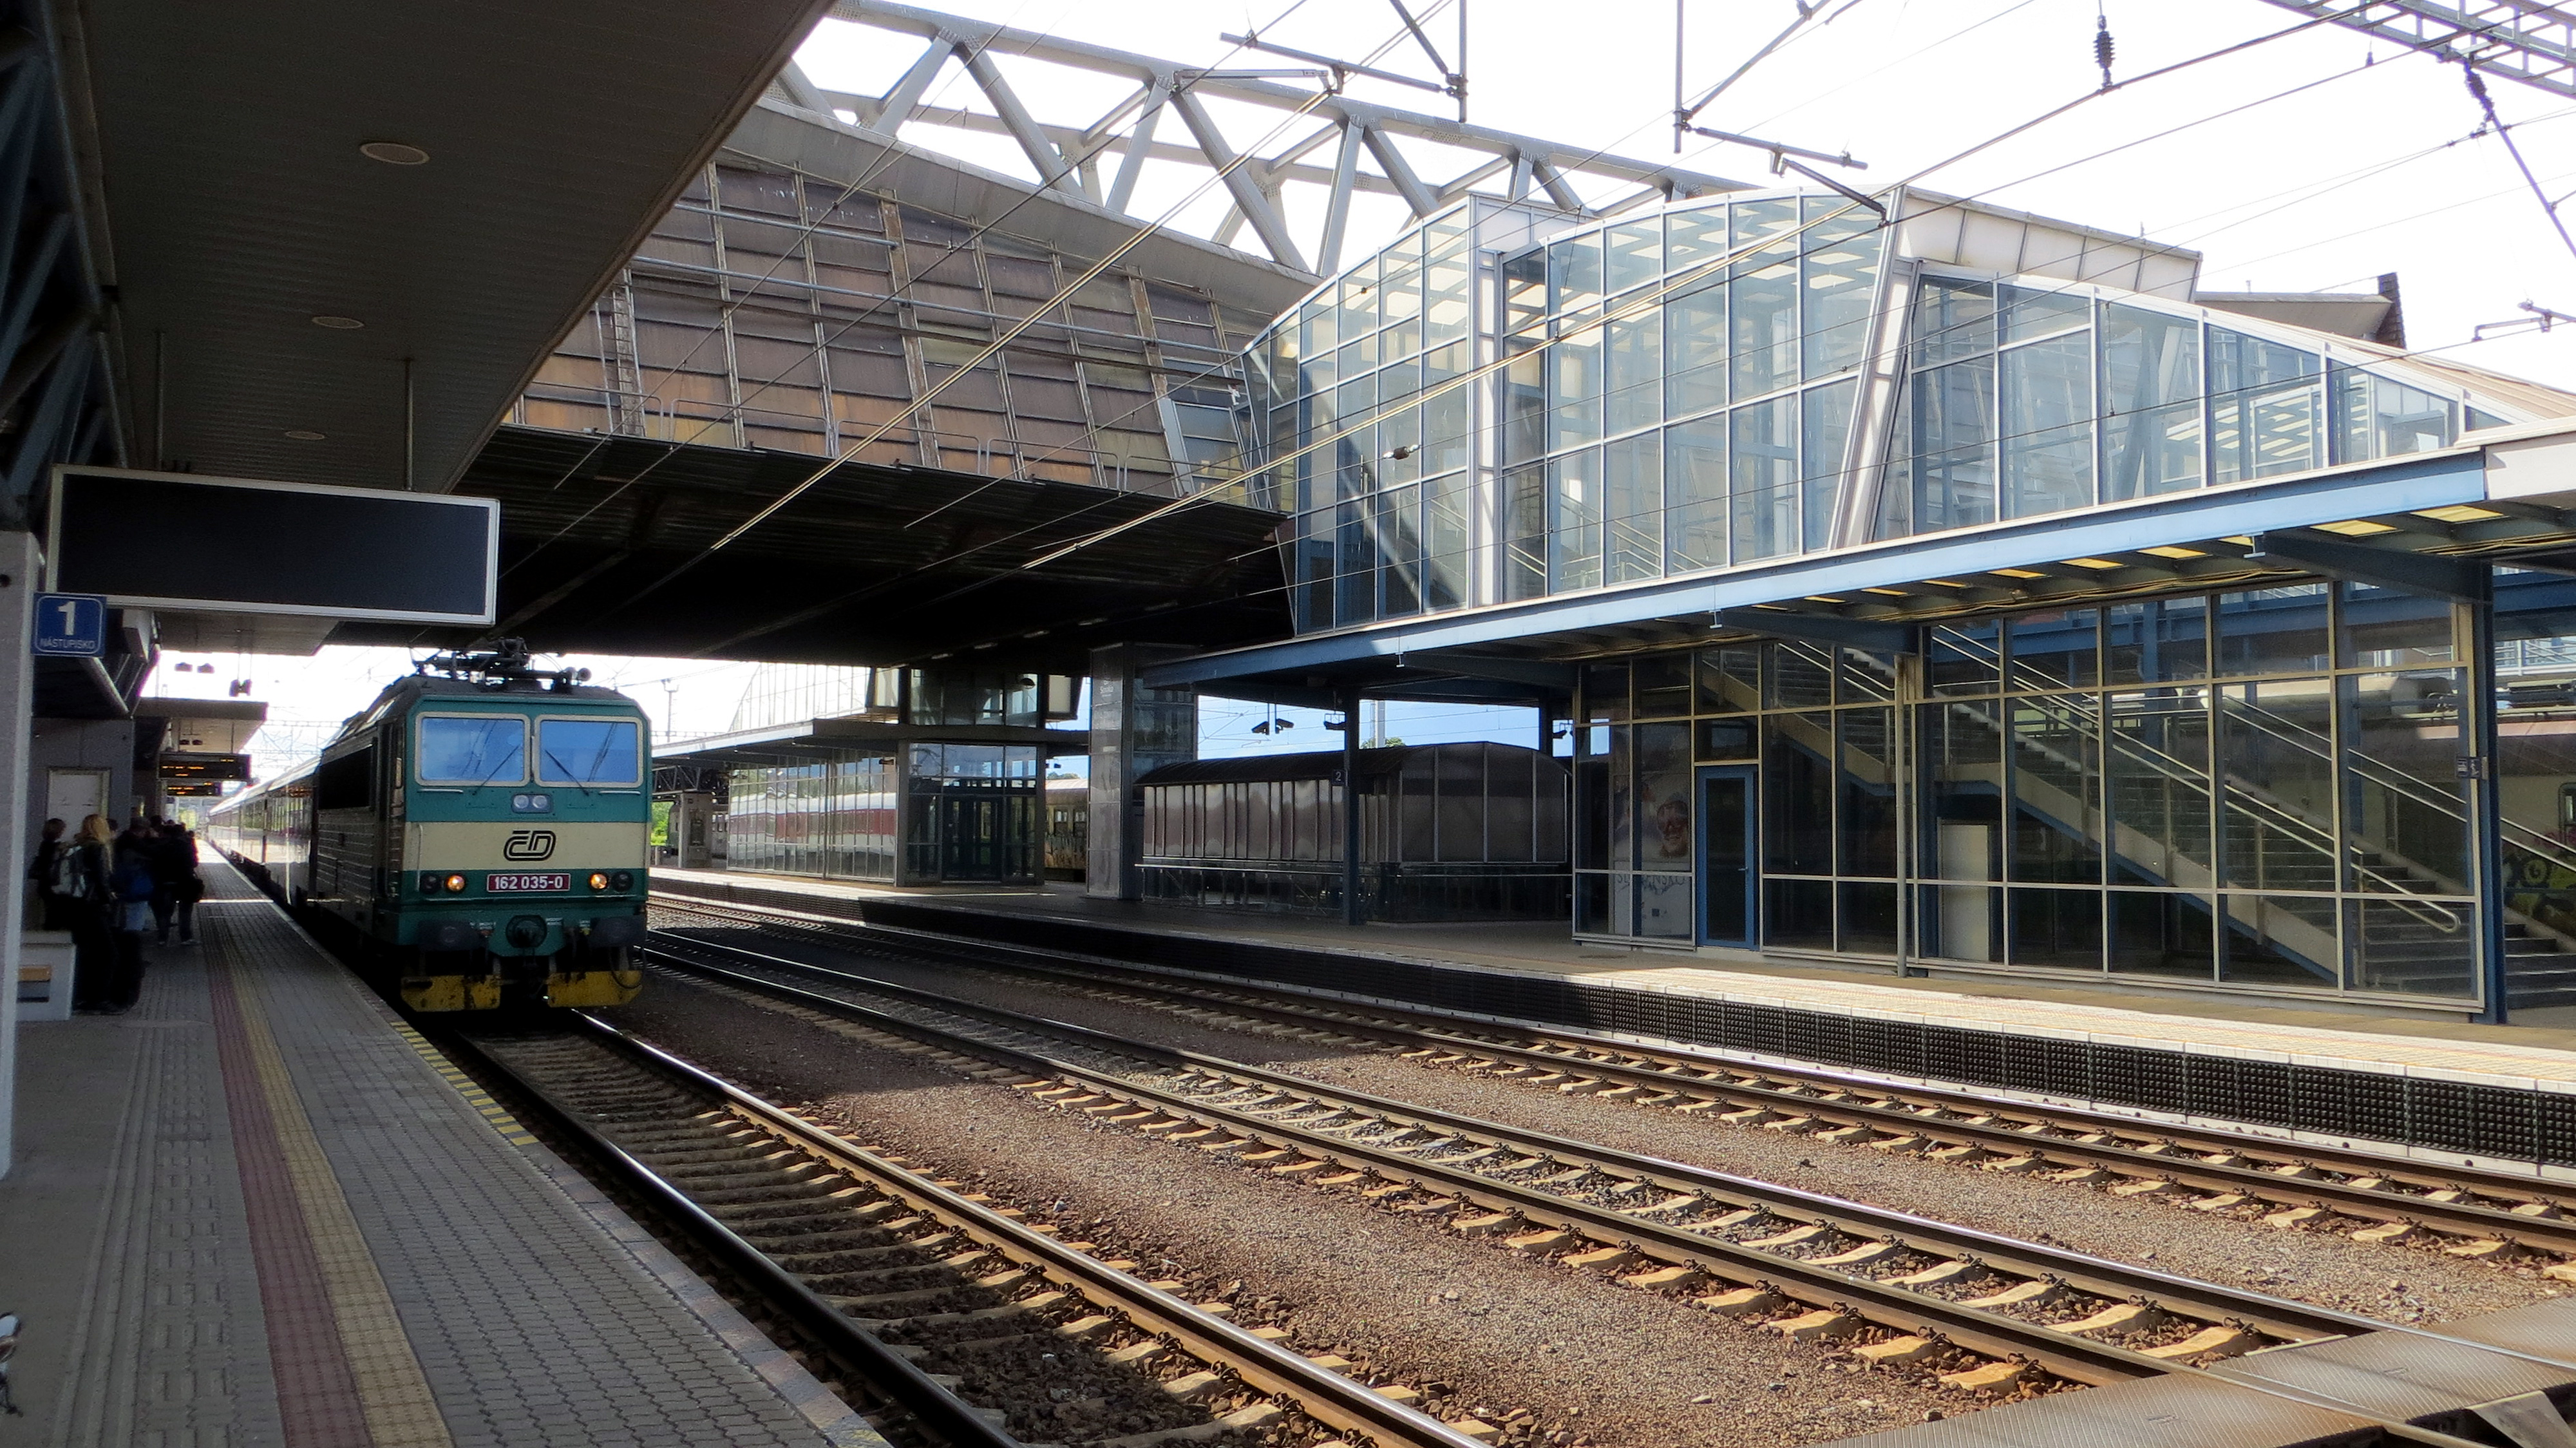 Trainstationspotting - Poprad train station, Slovakia, 2013